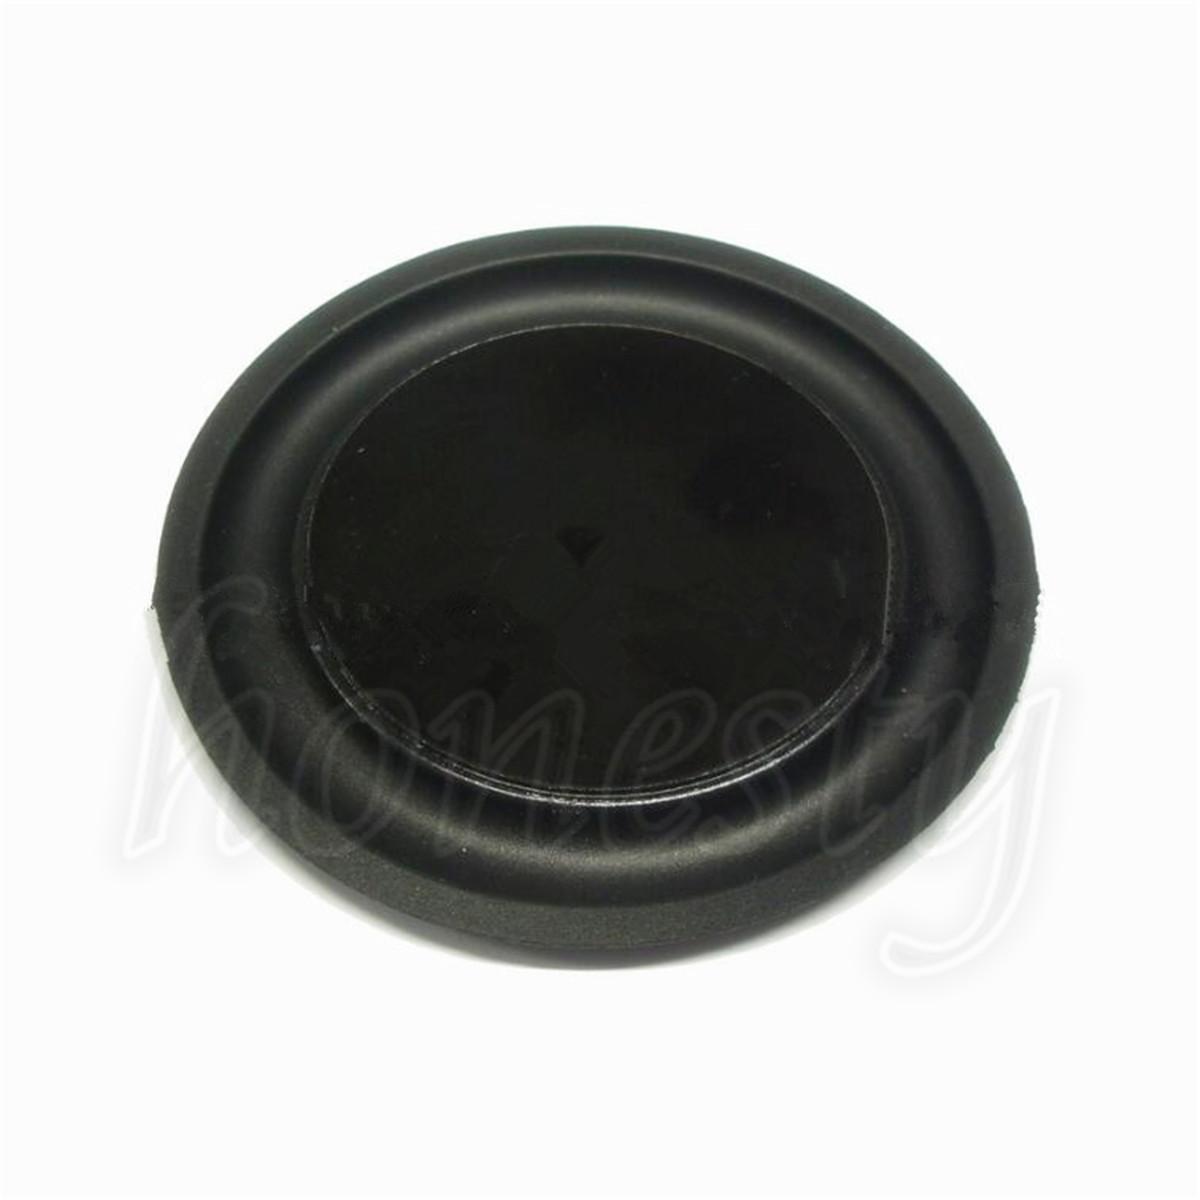 Rubber D/&D PowerDrive 452460R1 CASE IH Replacement Belt